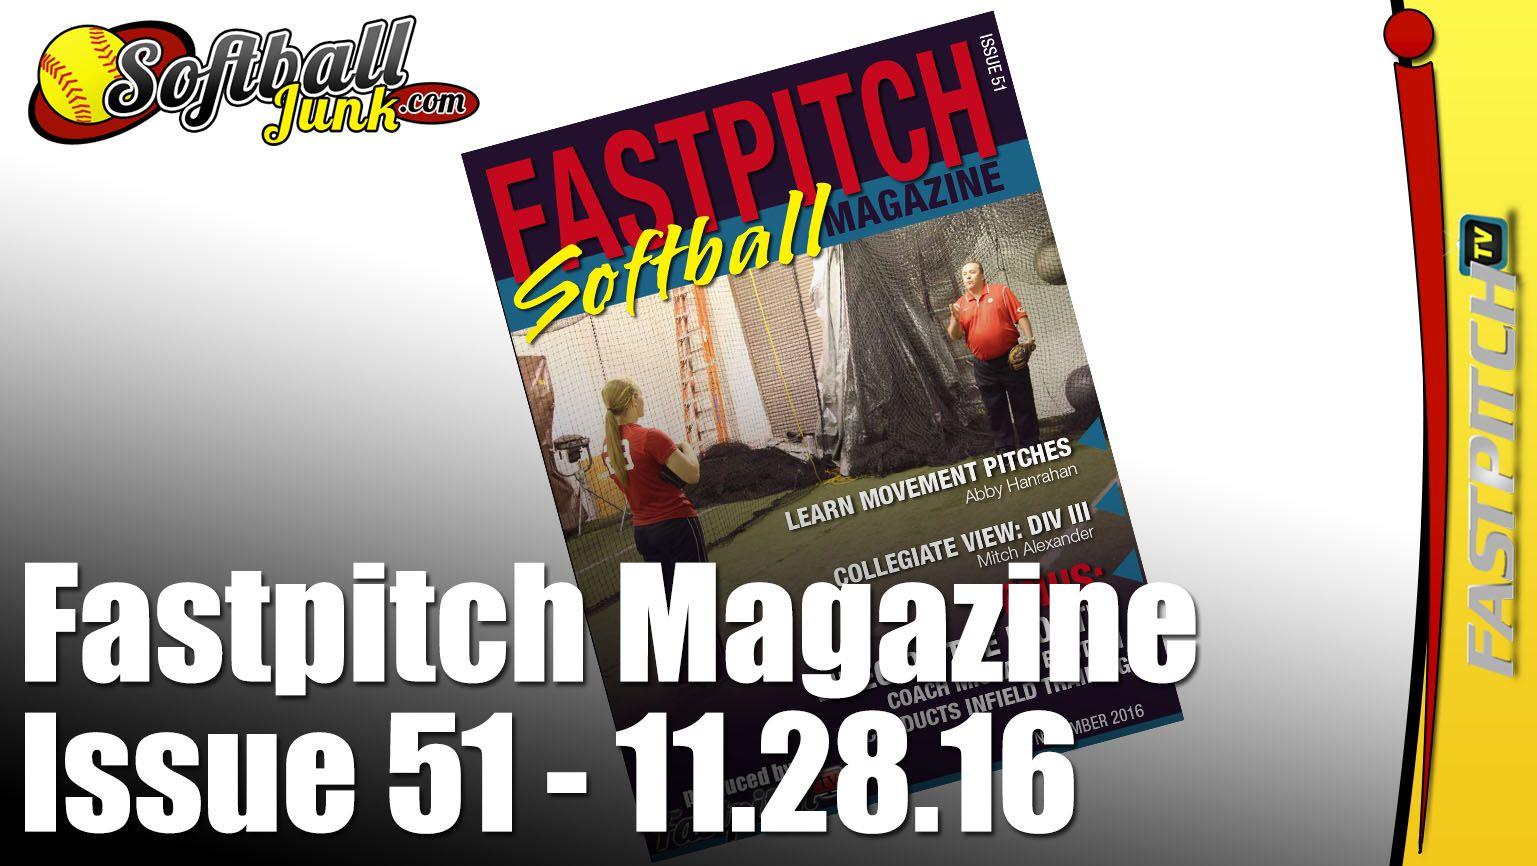 Pin by Softball Fastpitch TV (Gary Leland) on Fastpitch